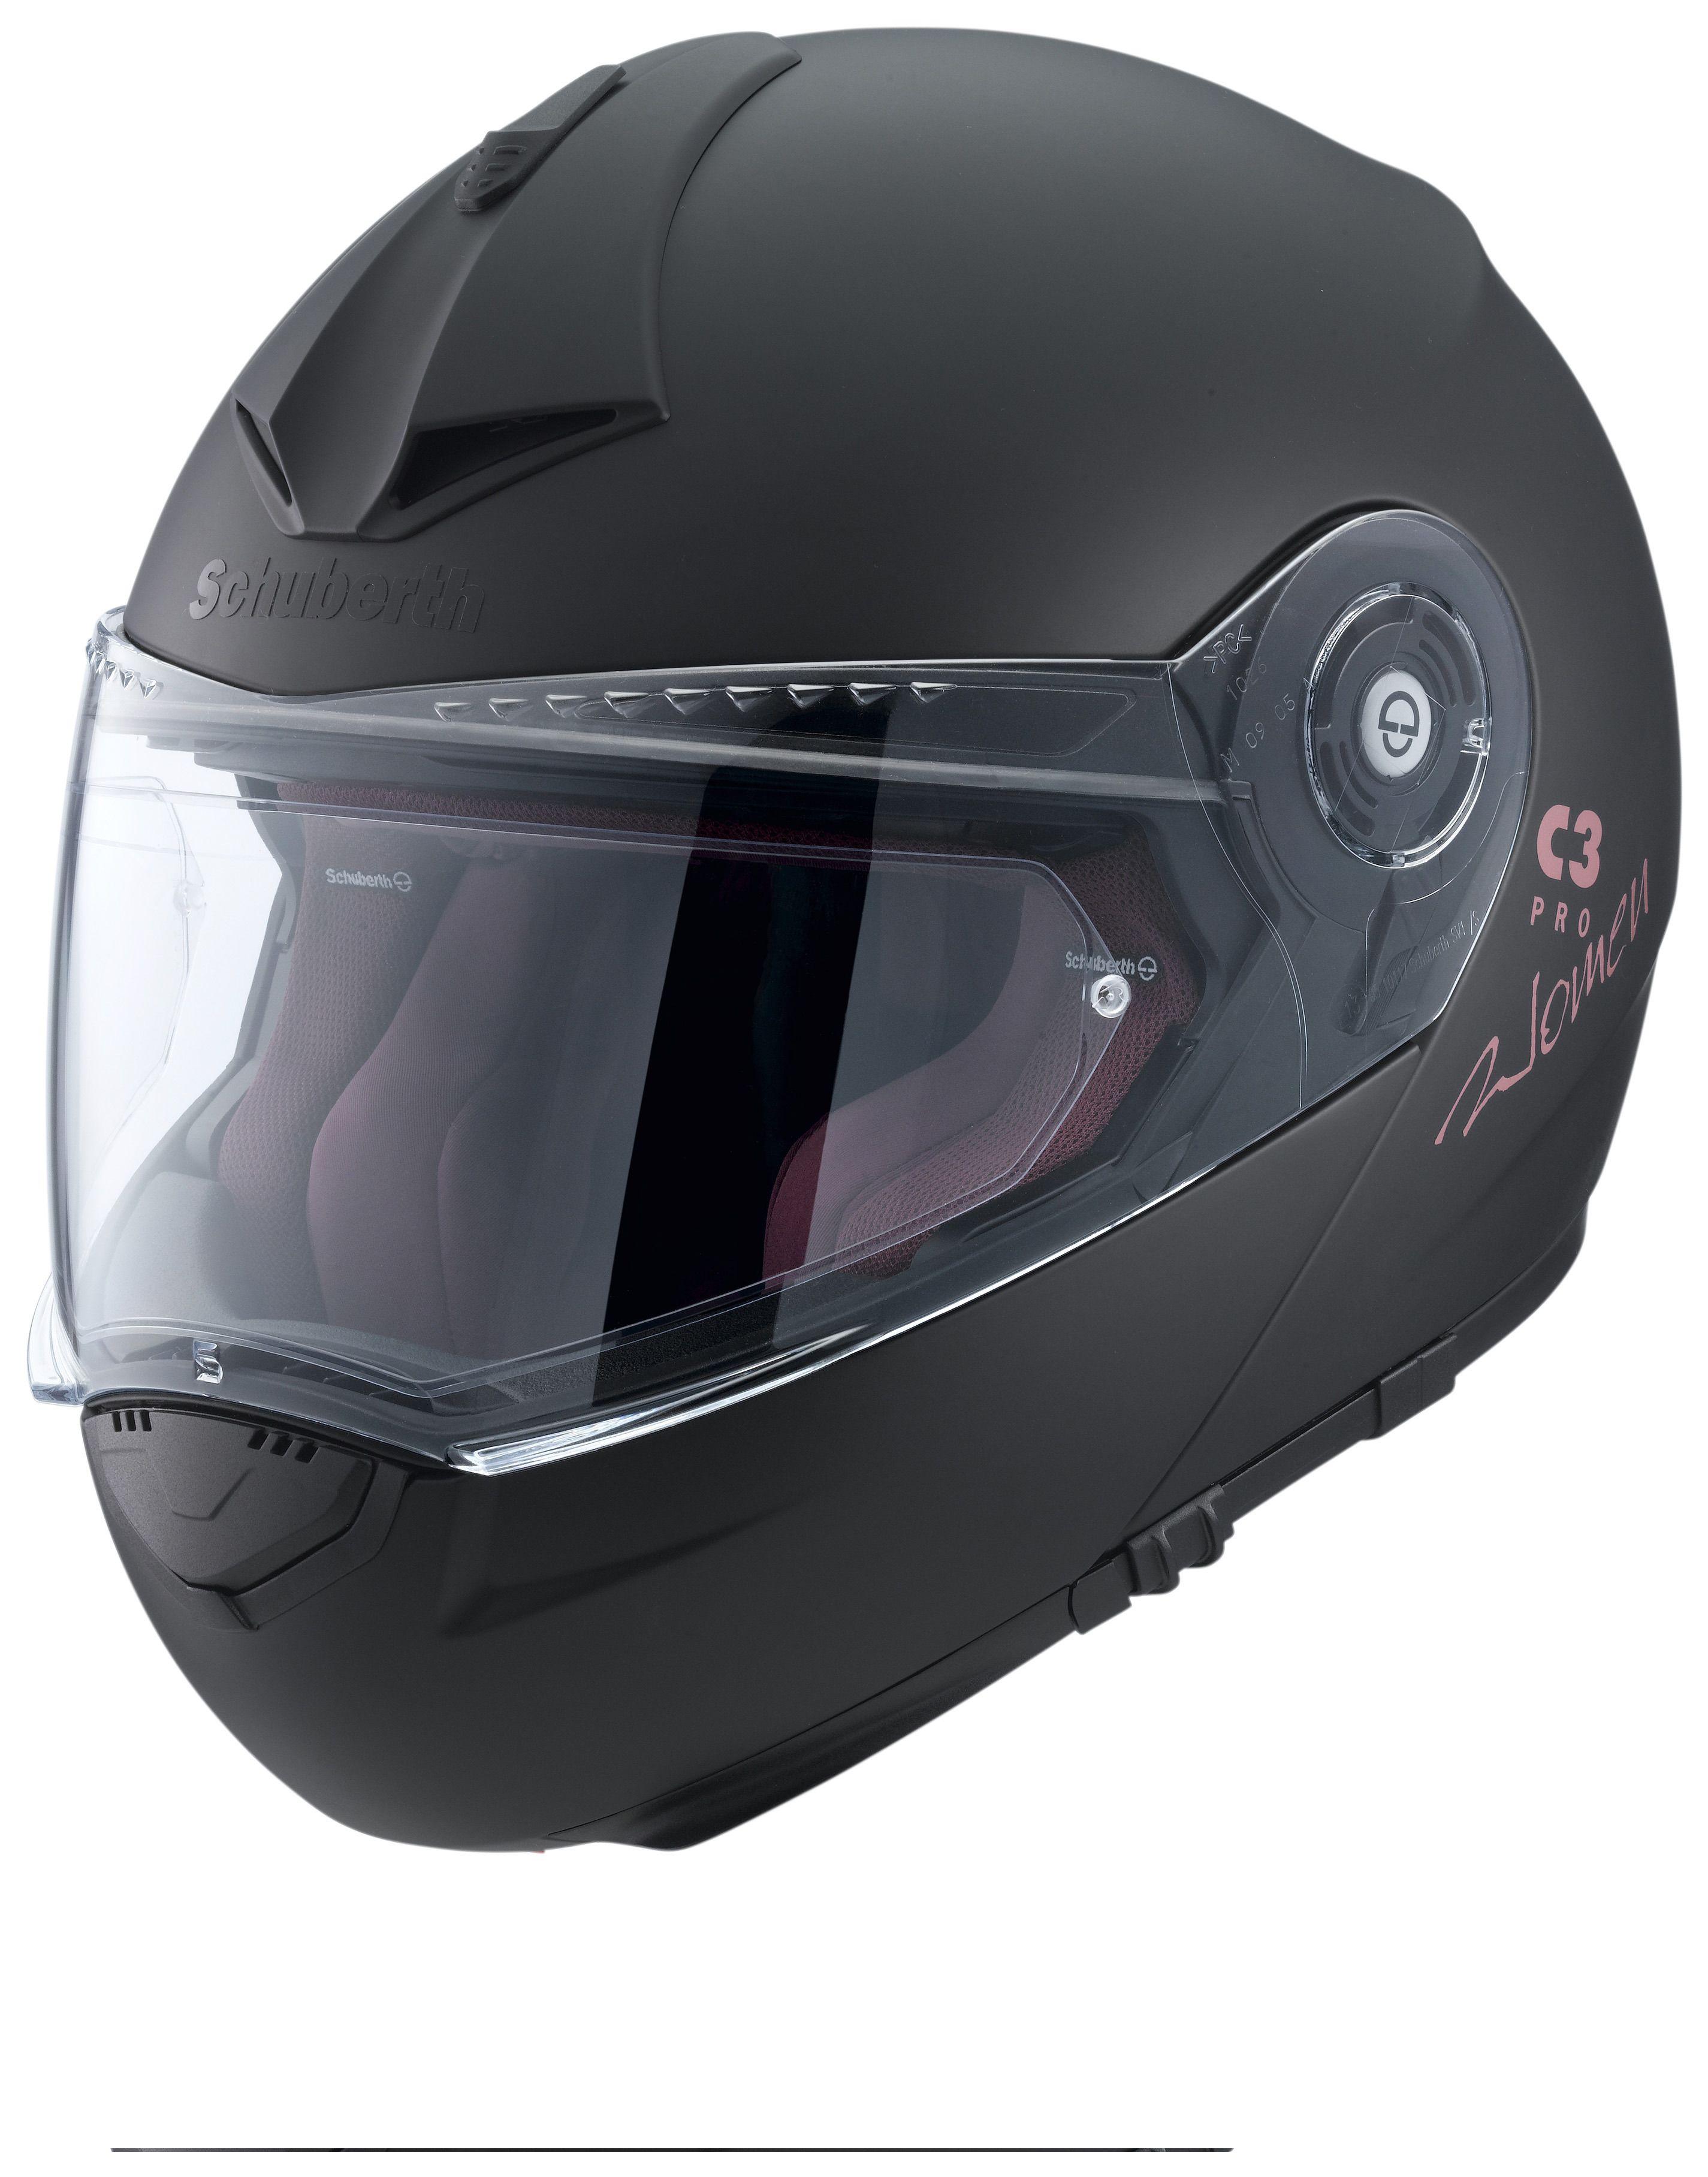 Schuberth C3 Pro Women's Helmet - RevZilla